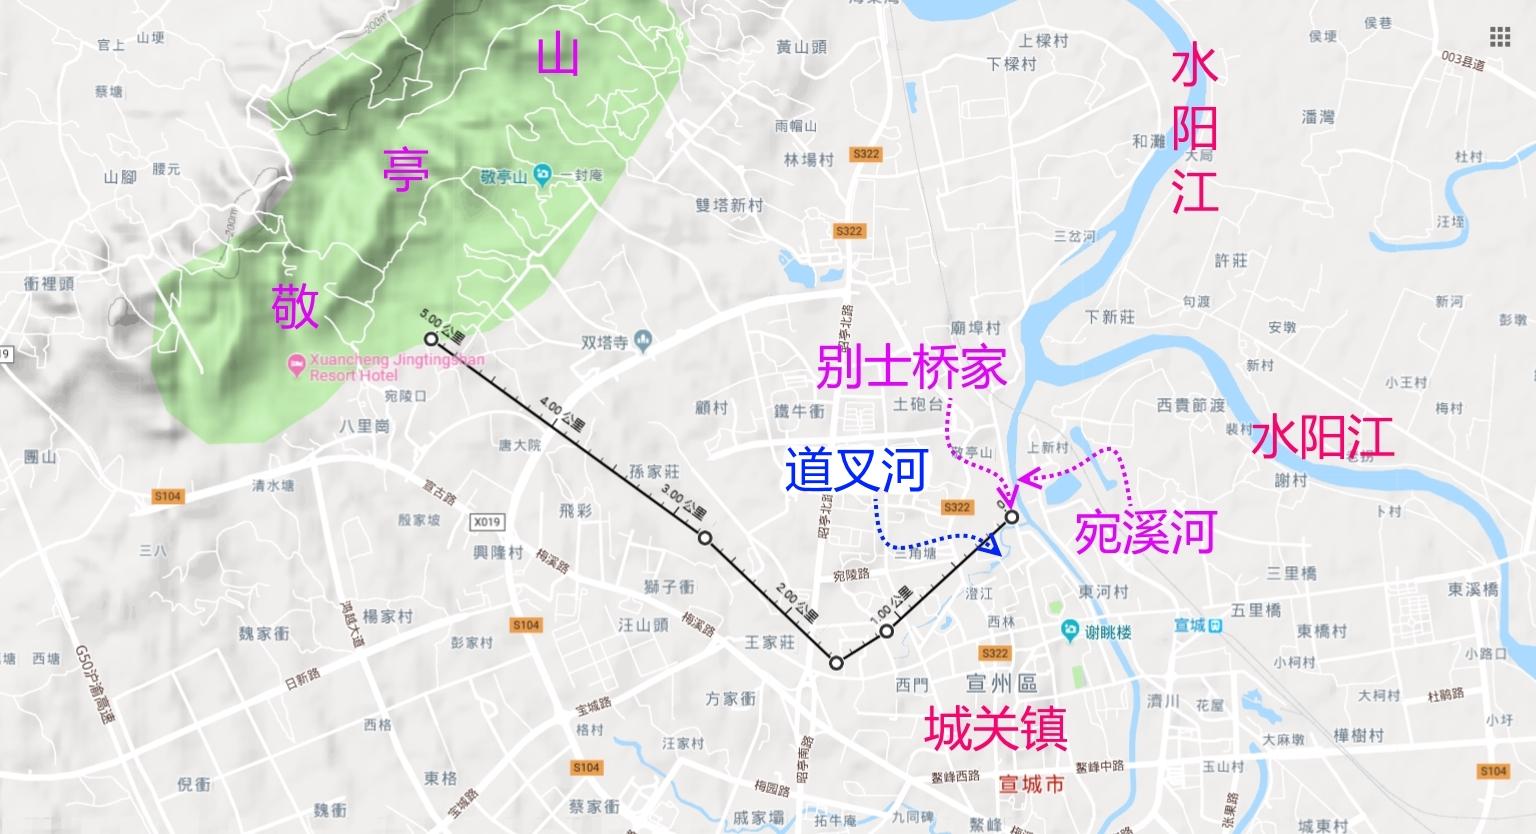 XC-river.jpg